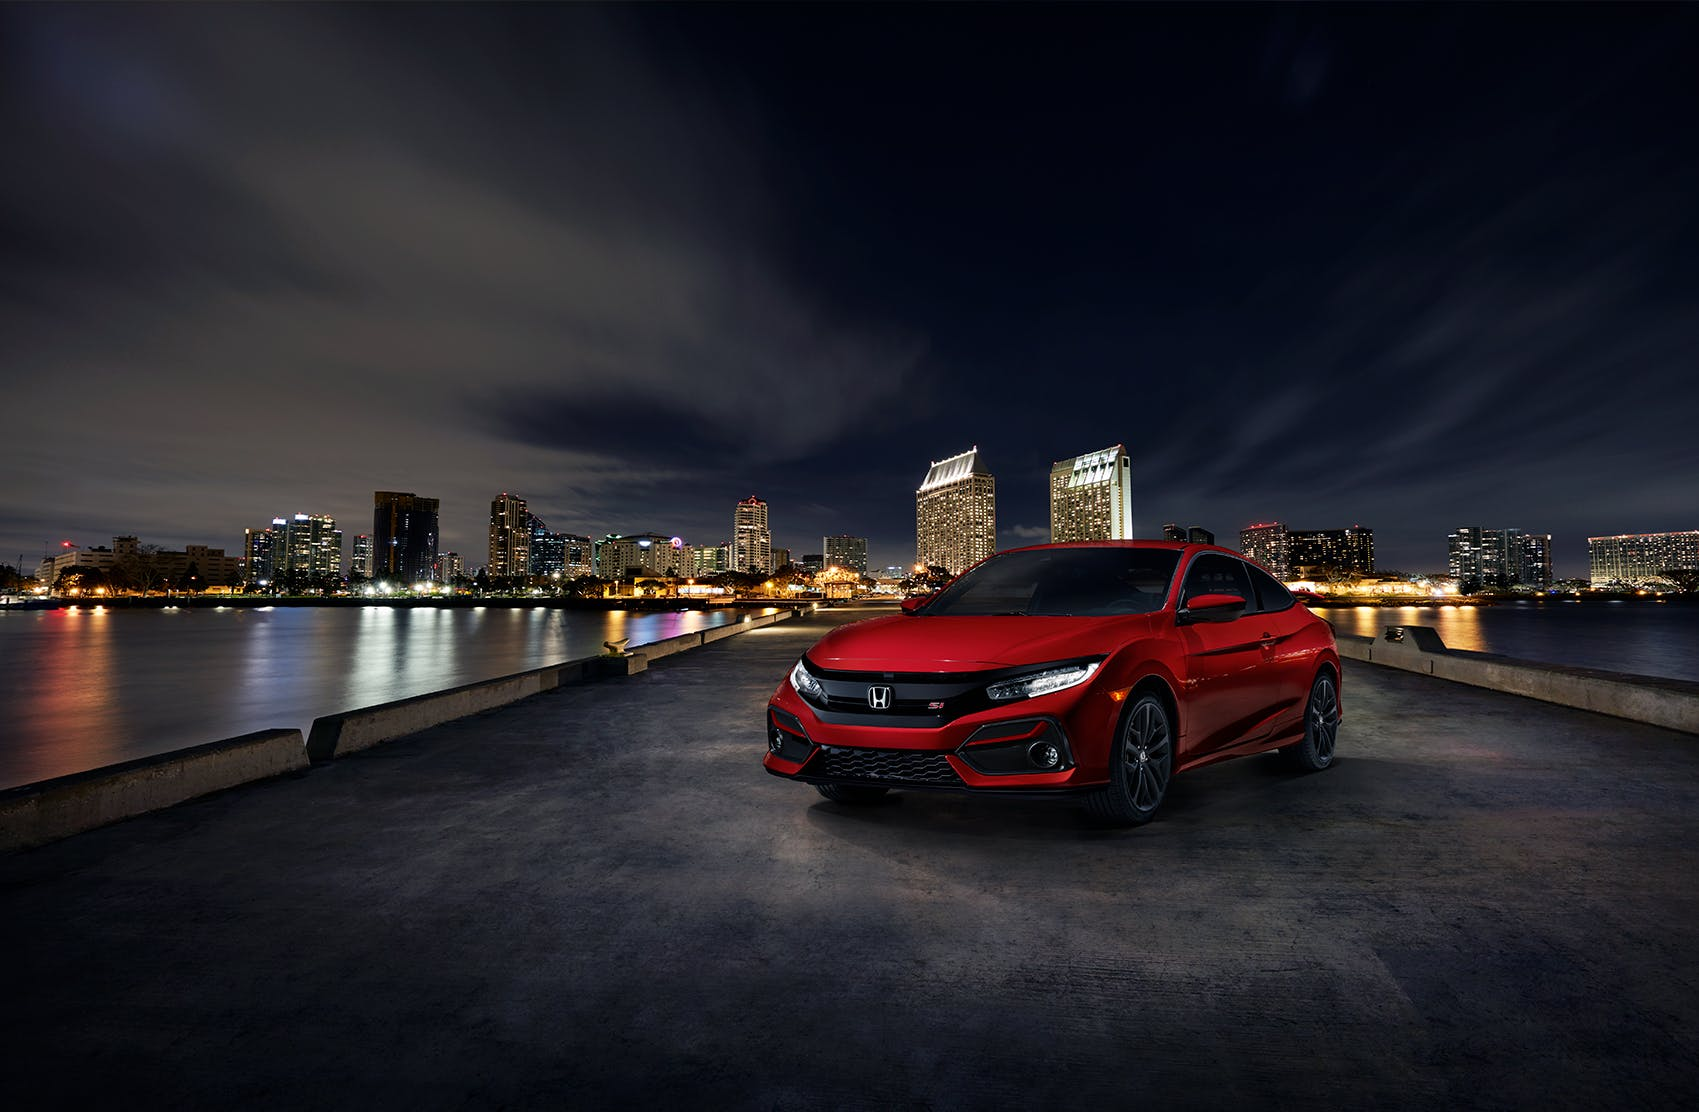 Washington Honda is a Honda Dealership near Wolfdale, PA | 2020 Honda Civic Coupe at night